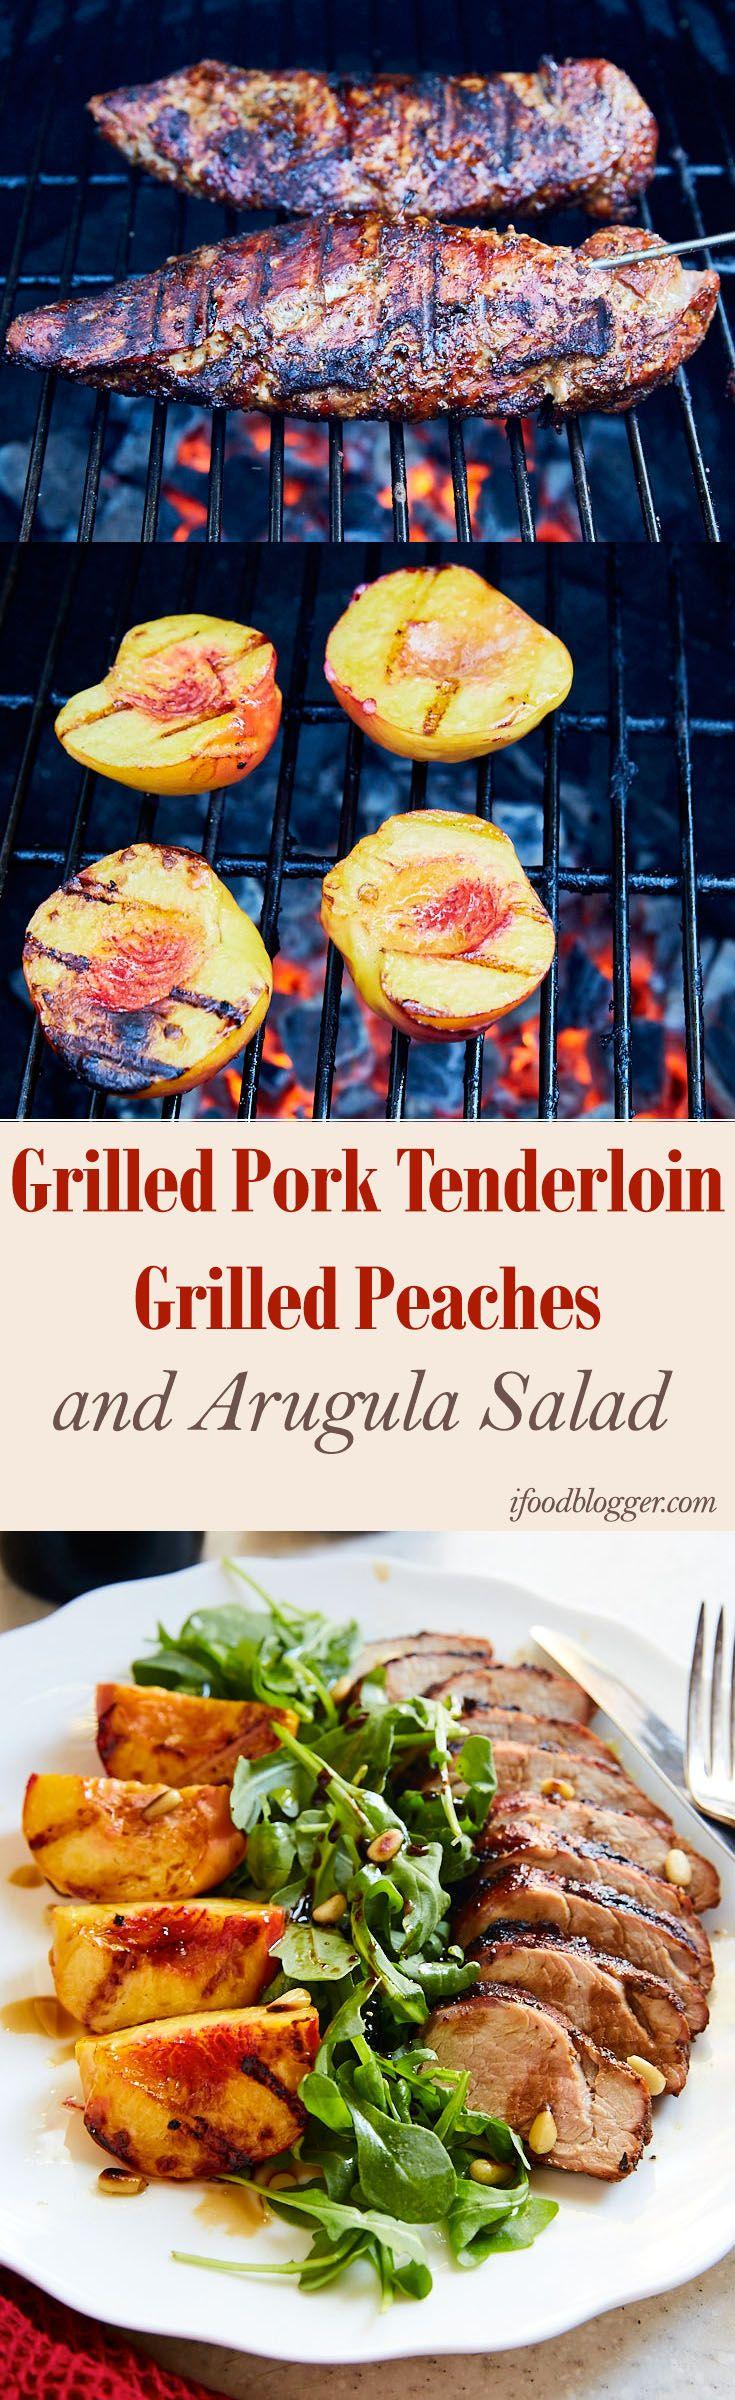 Grilled Pork Tenderloin, Peach and Arugula Salad